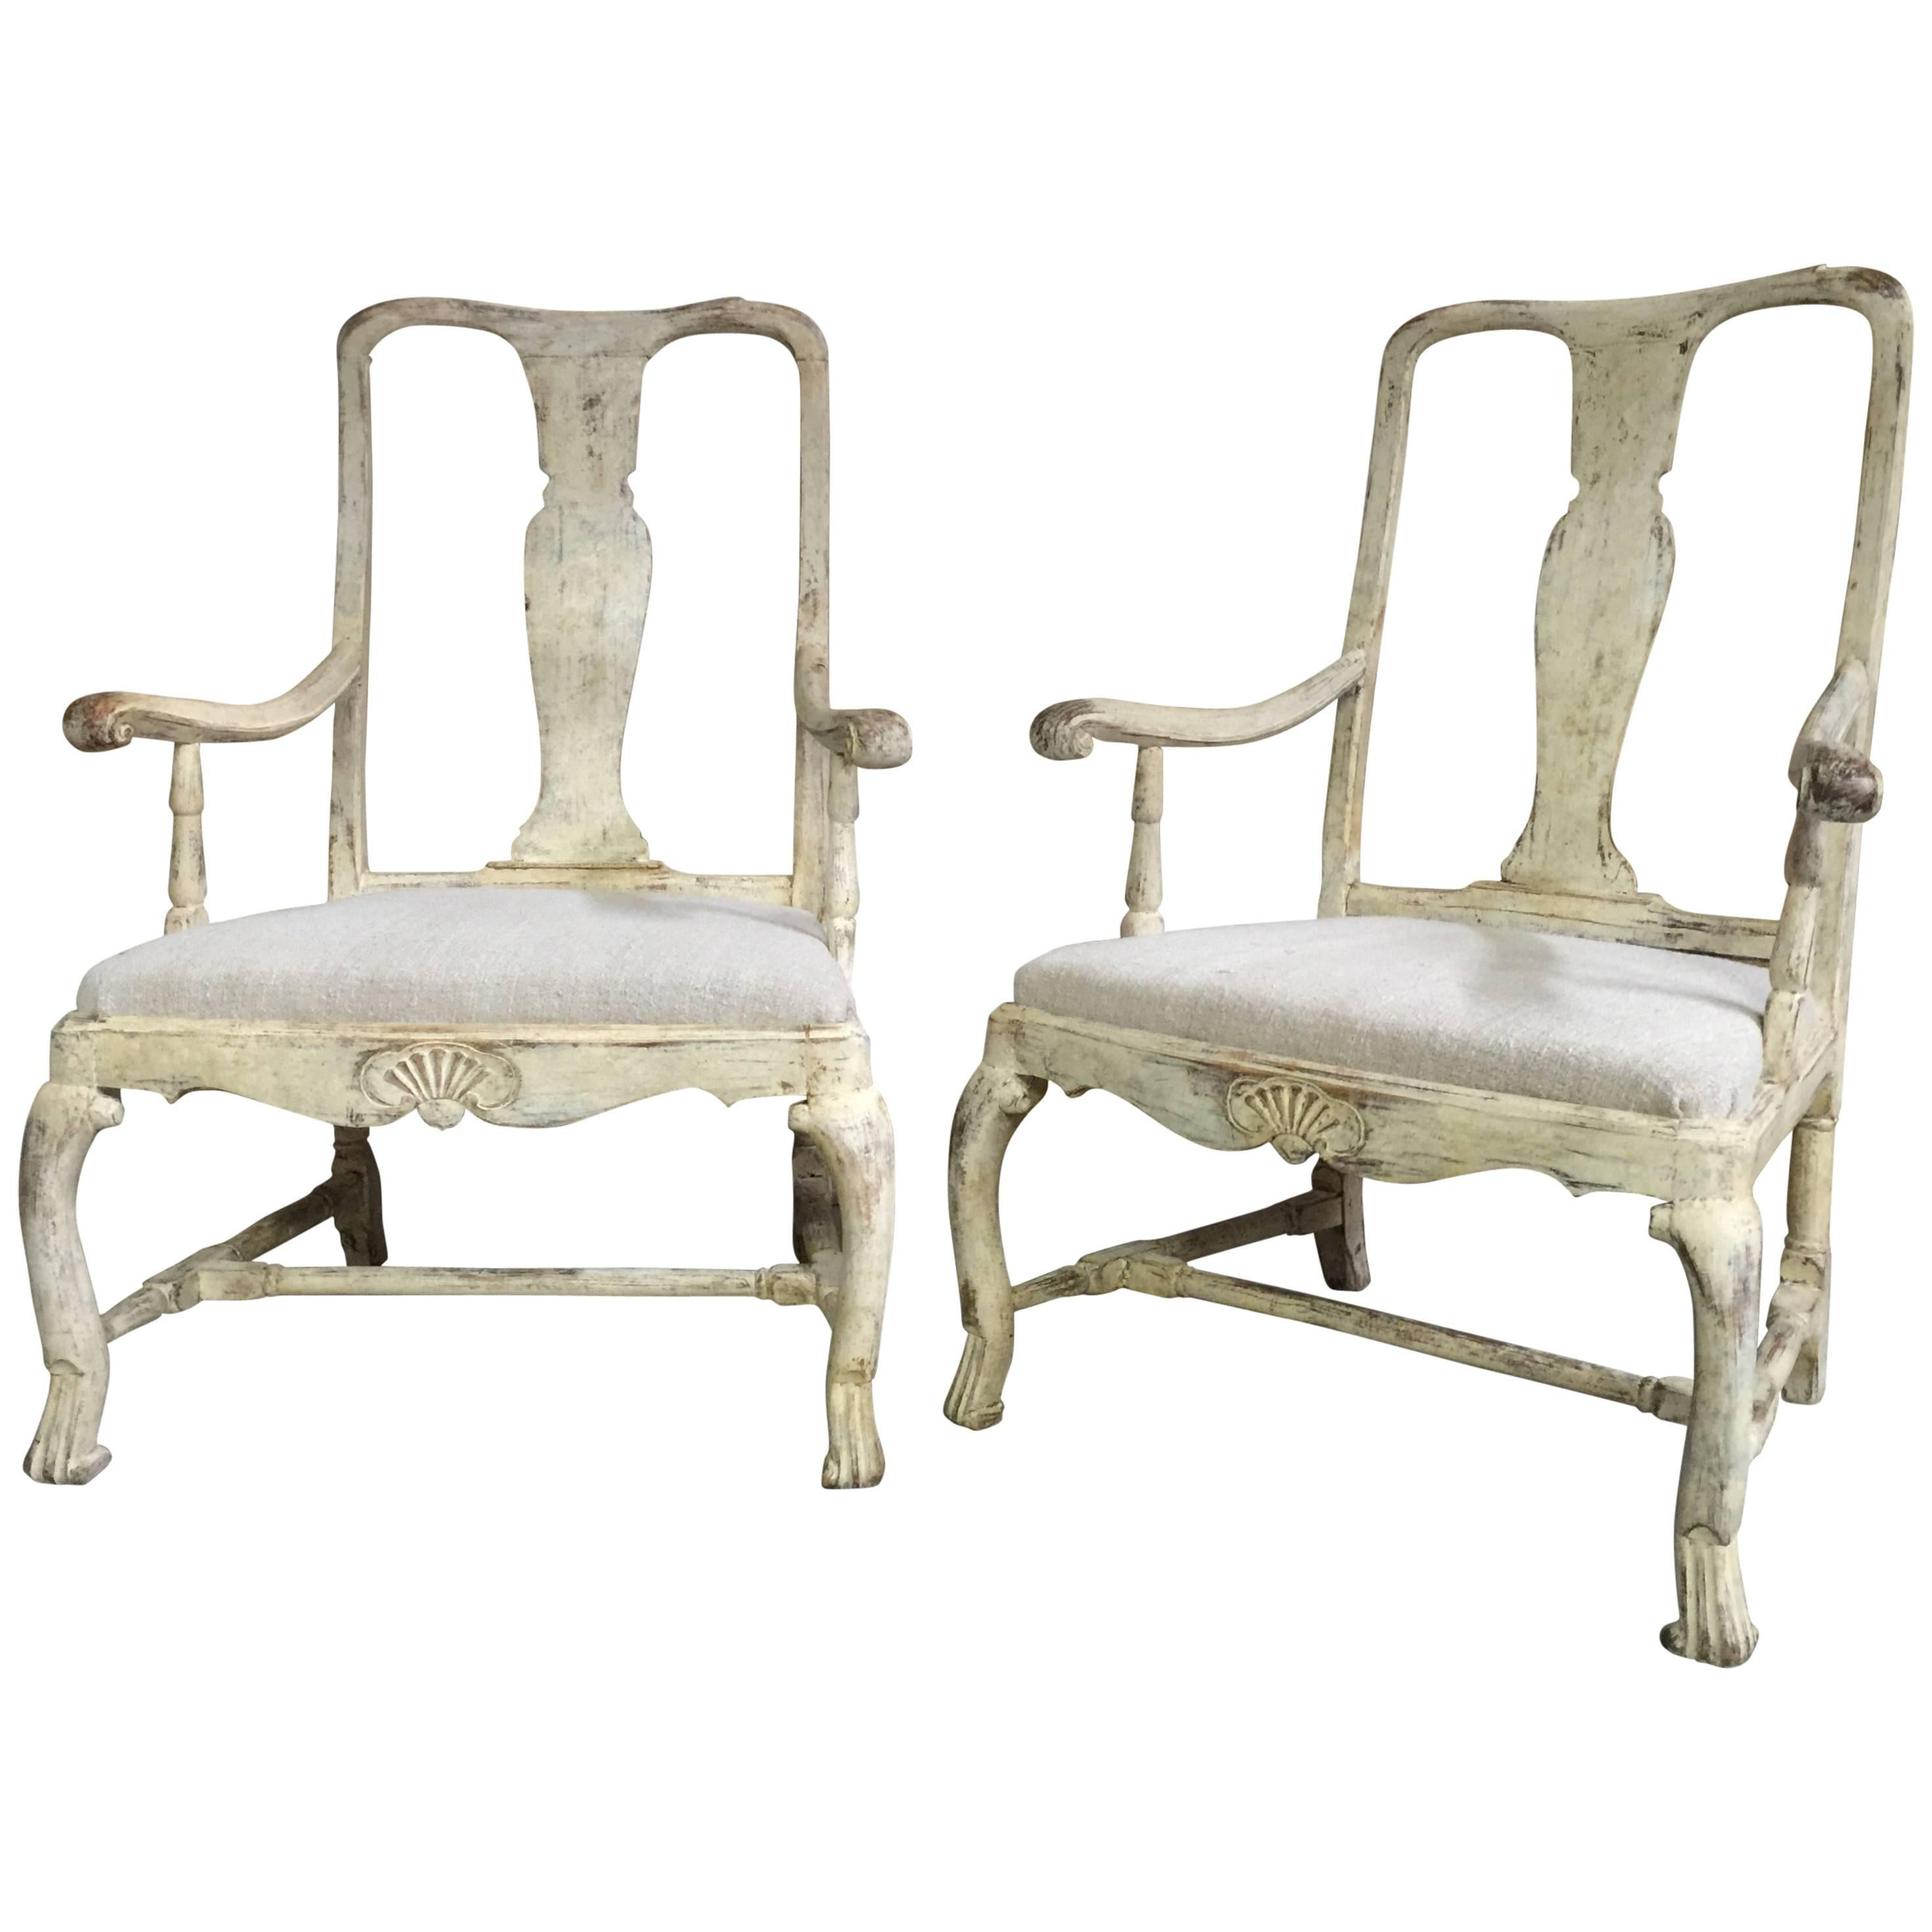 Pair of 18th Century Swedish Period Rococo Chairs